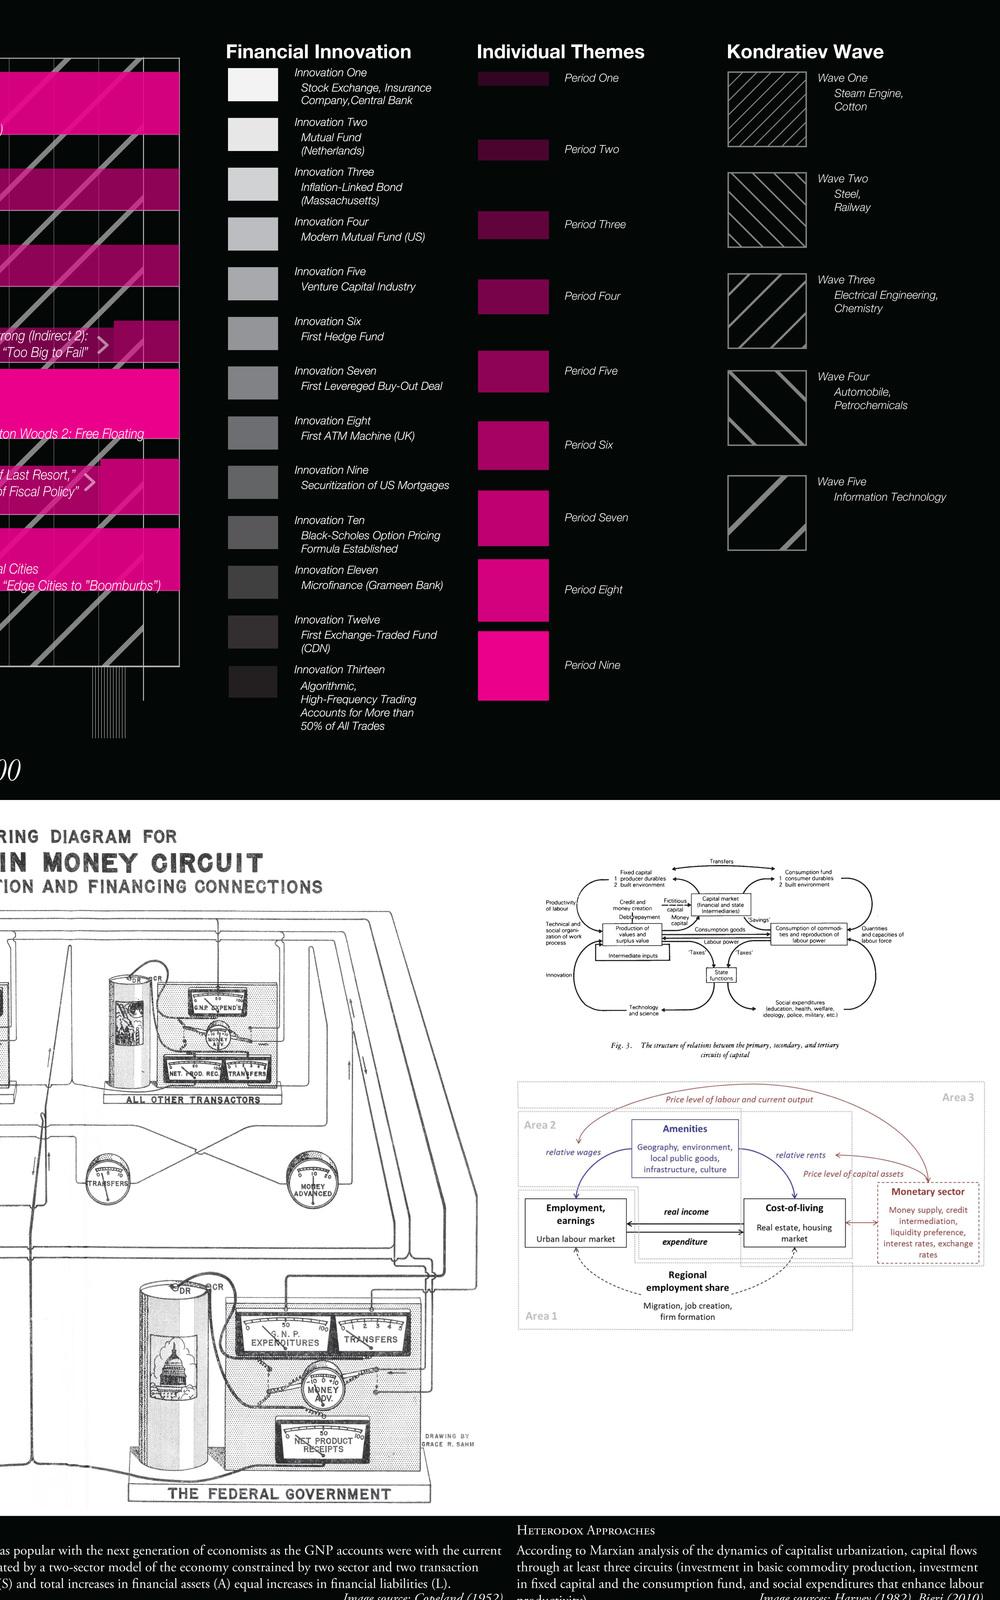 1107_DSB_Panel 3-4_series2-6.jpg